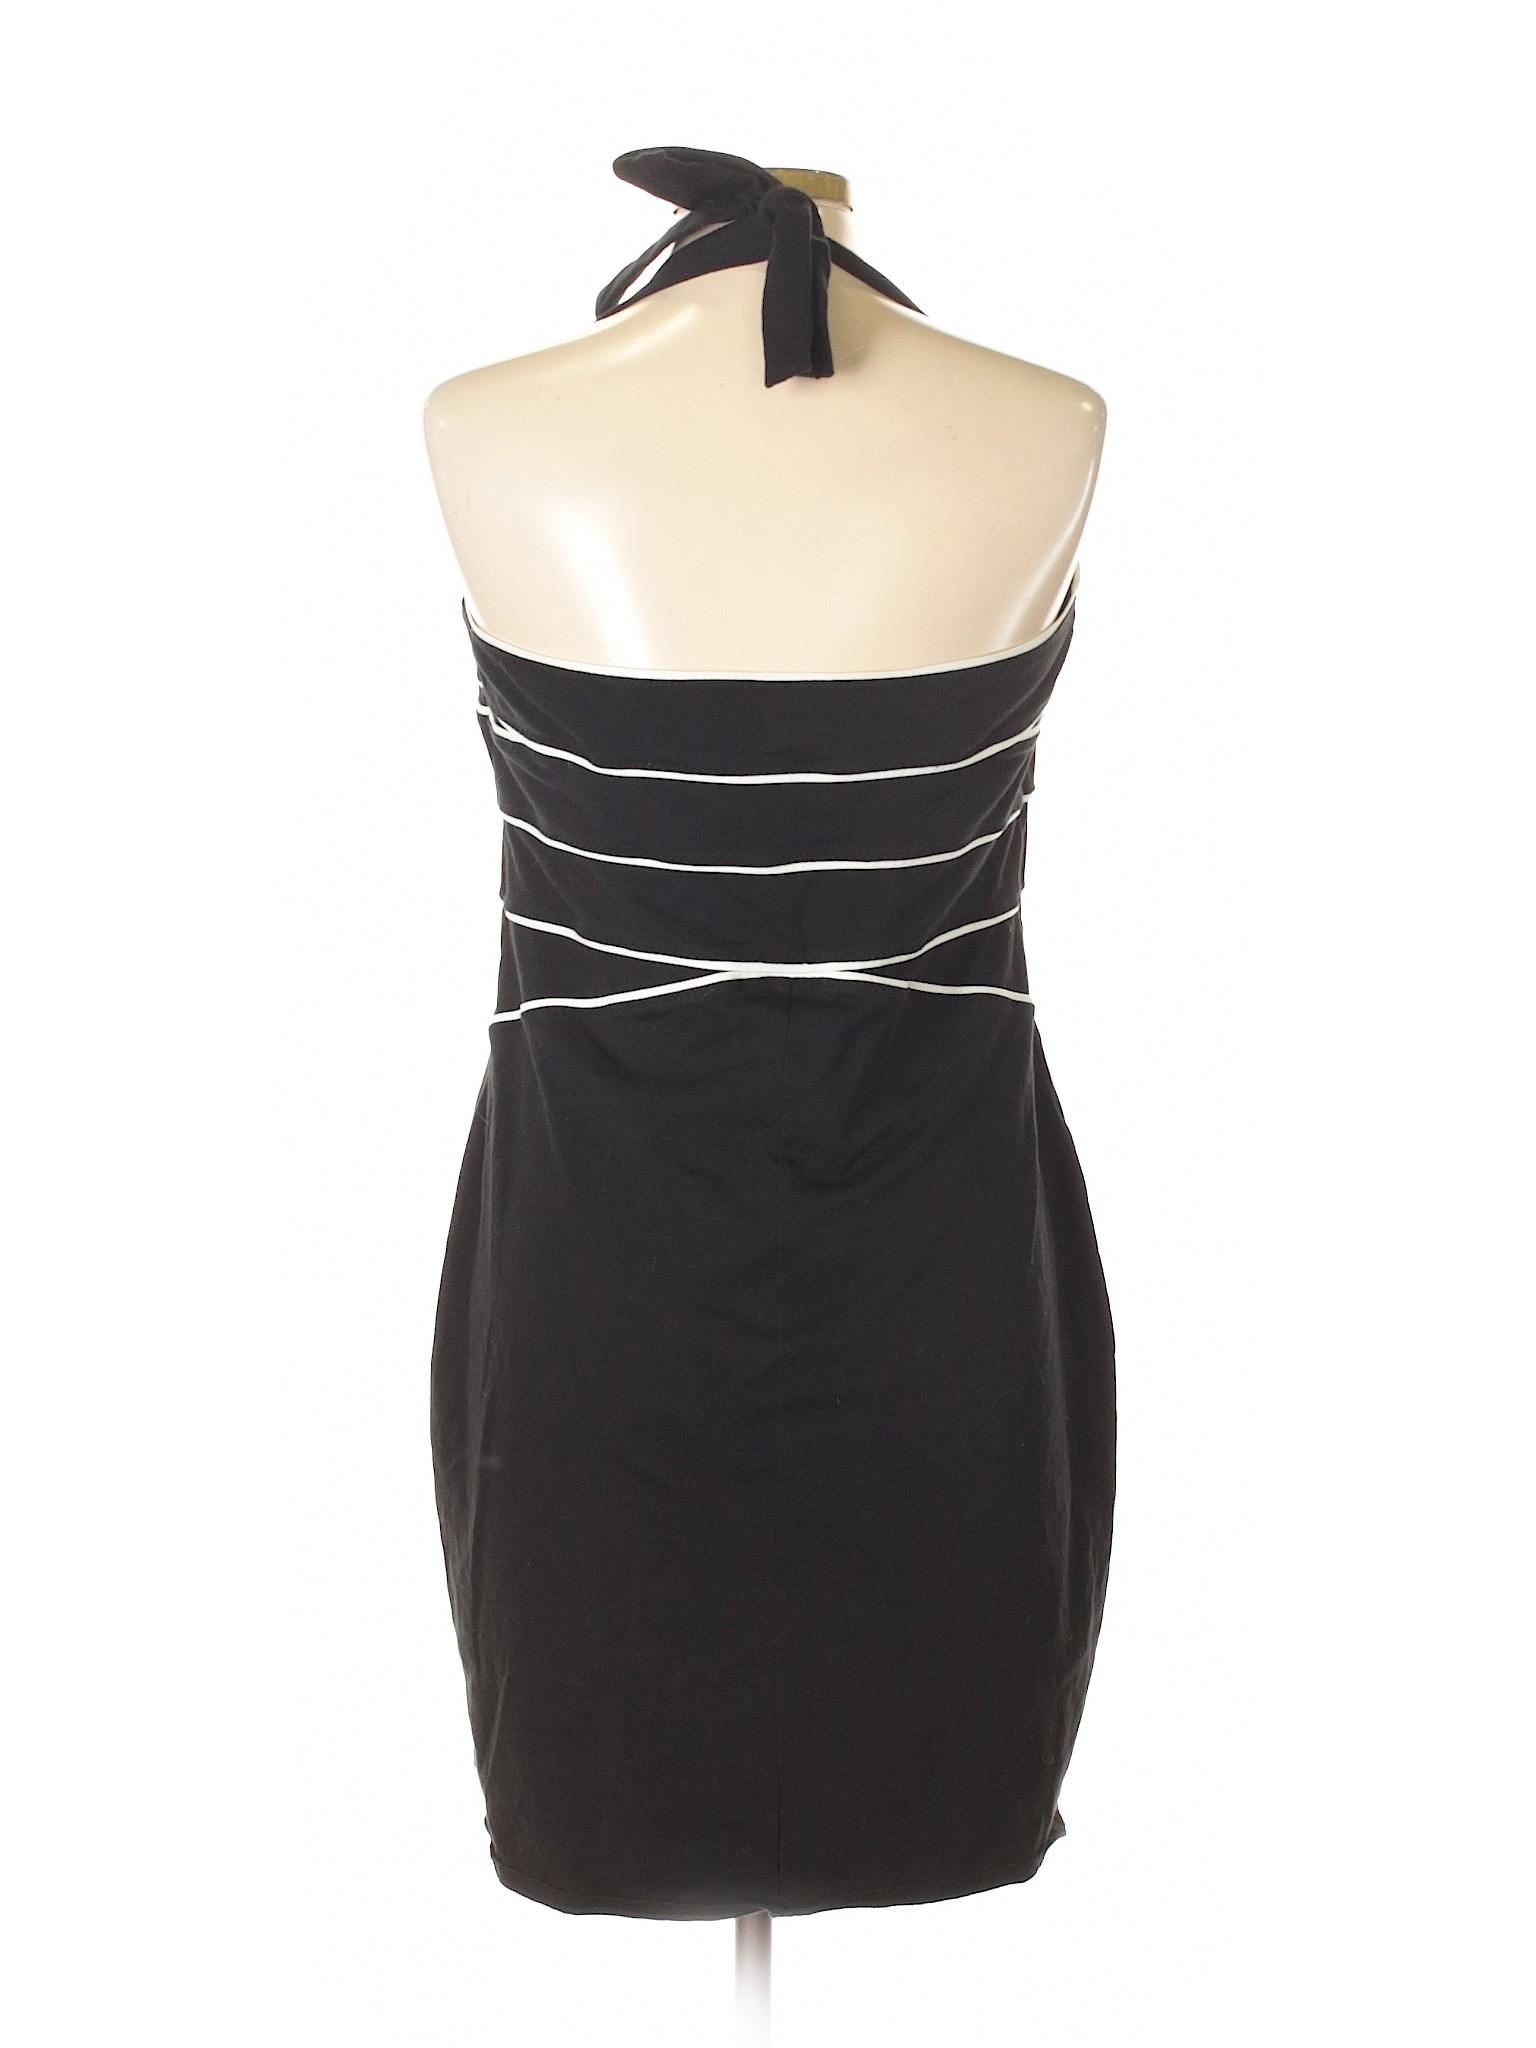 Casual Selling Tops VS Dress Bra UtqRCwgt